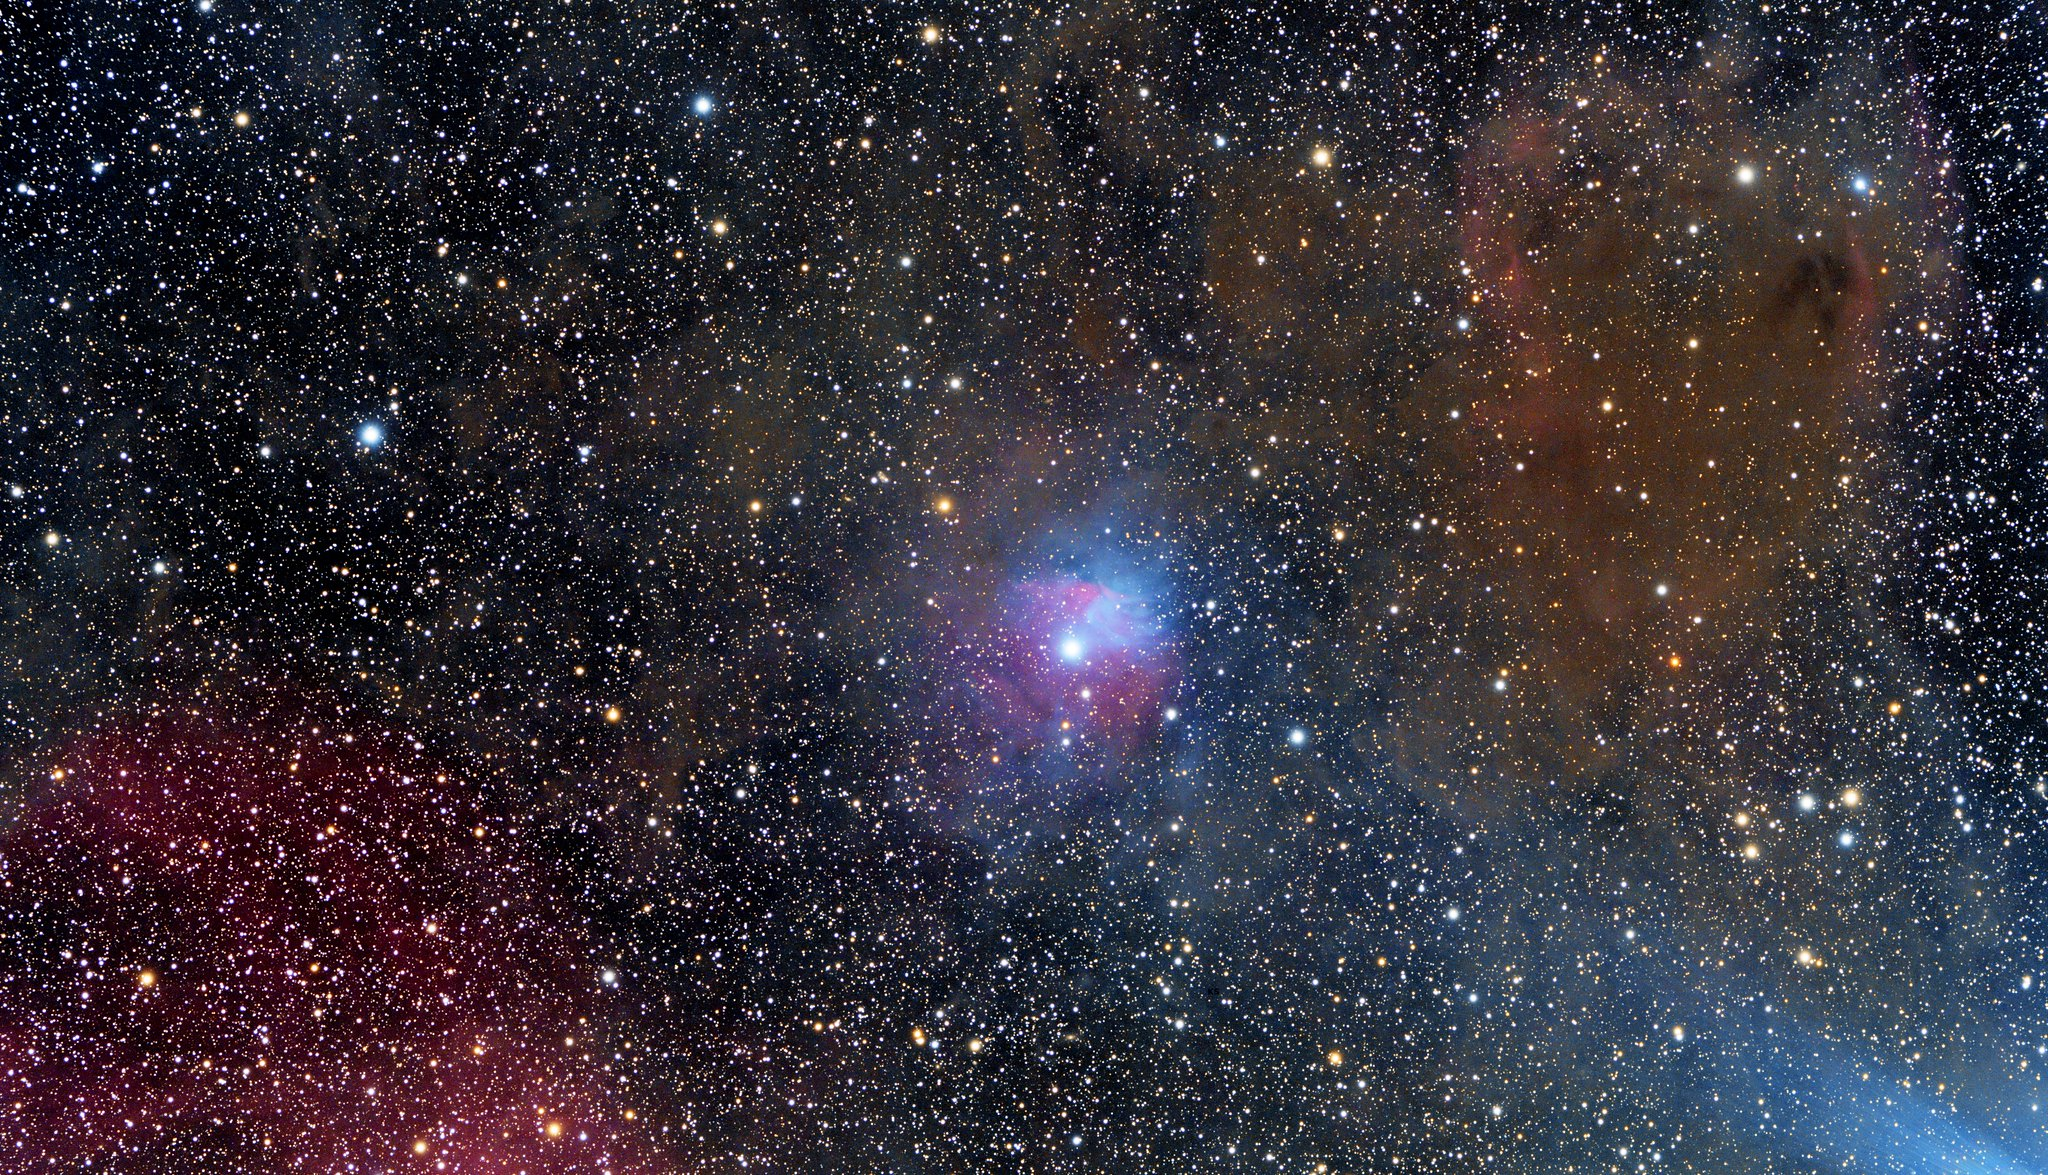 orion nebula sh2 - photo #17